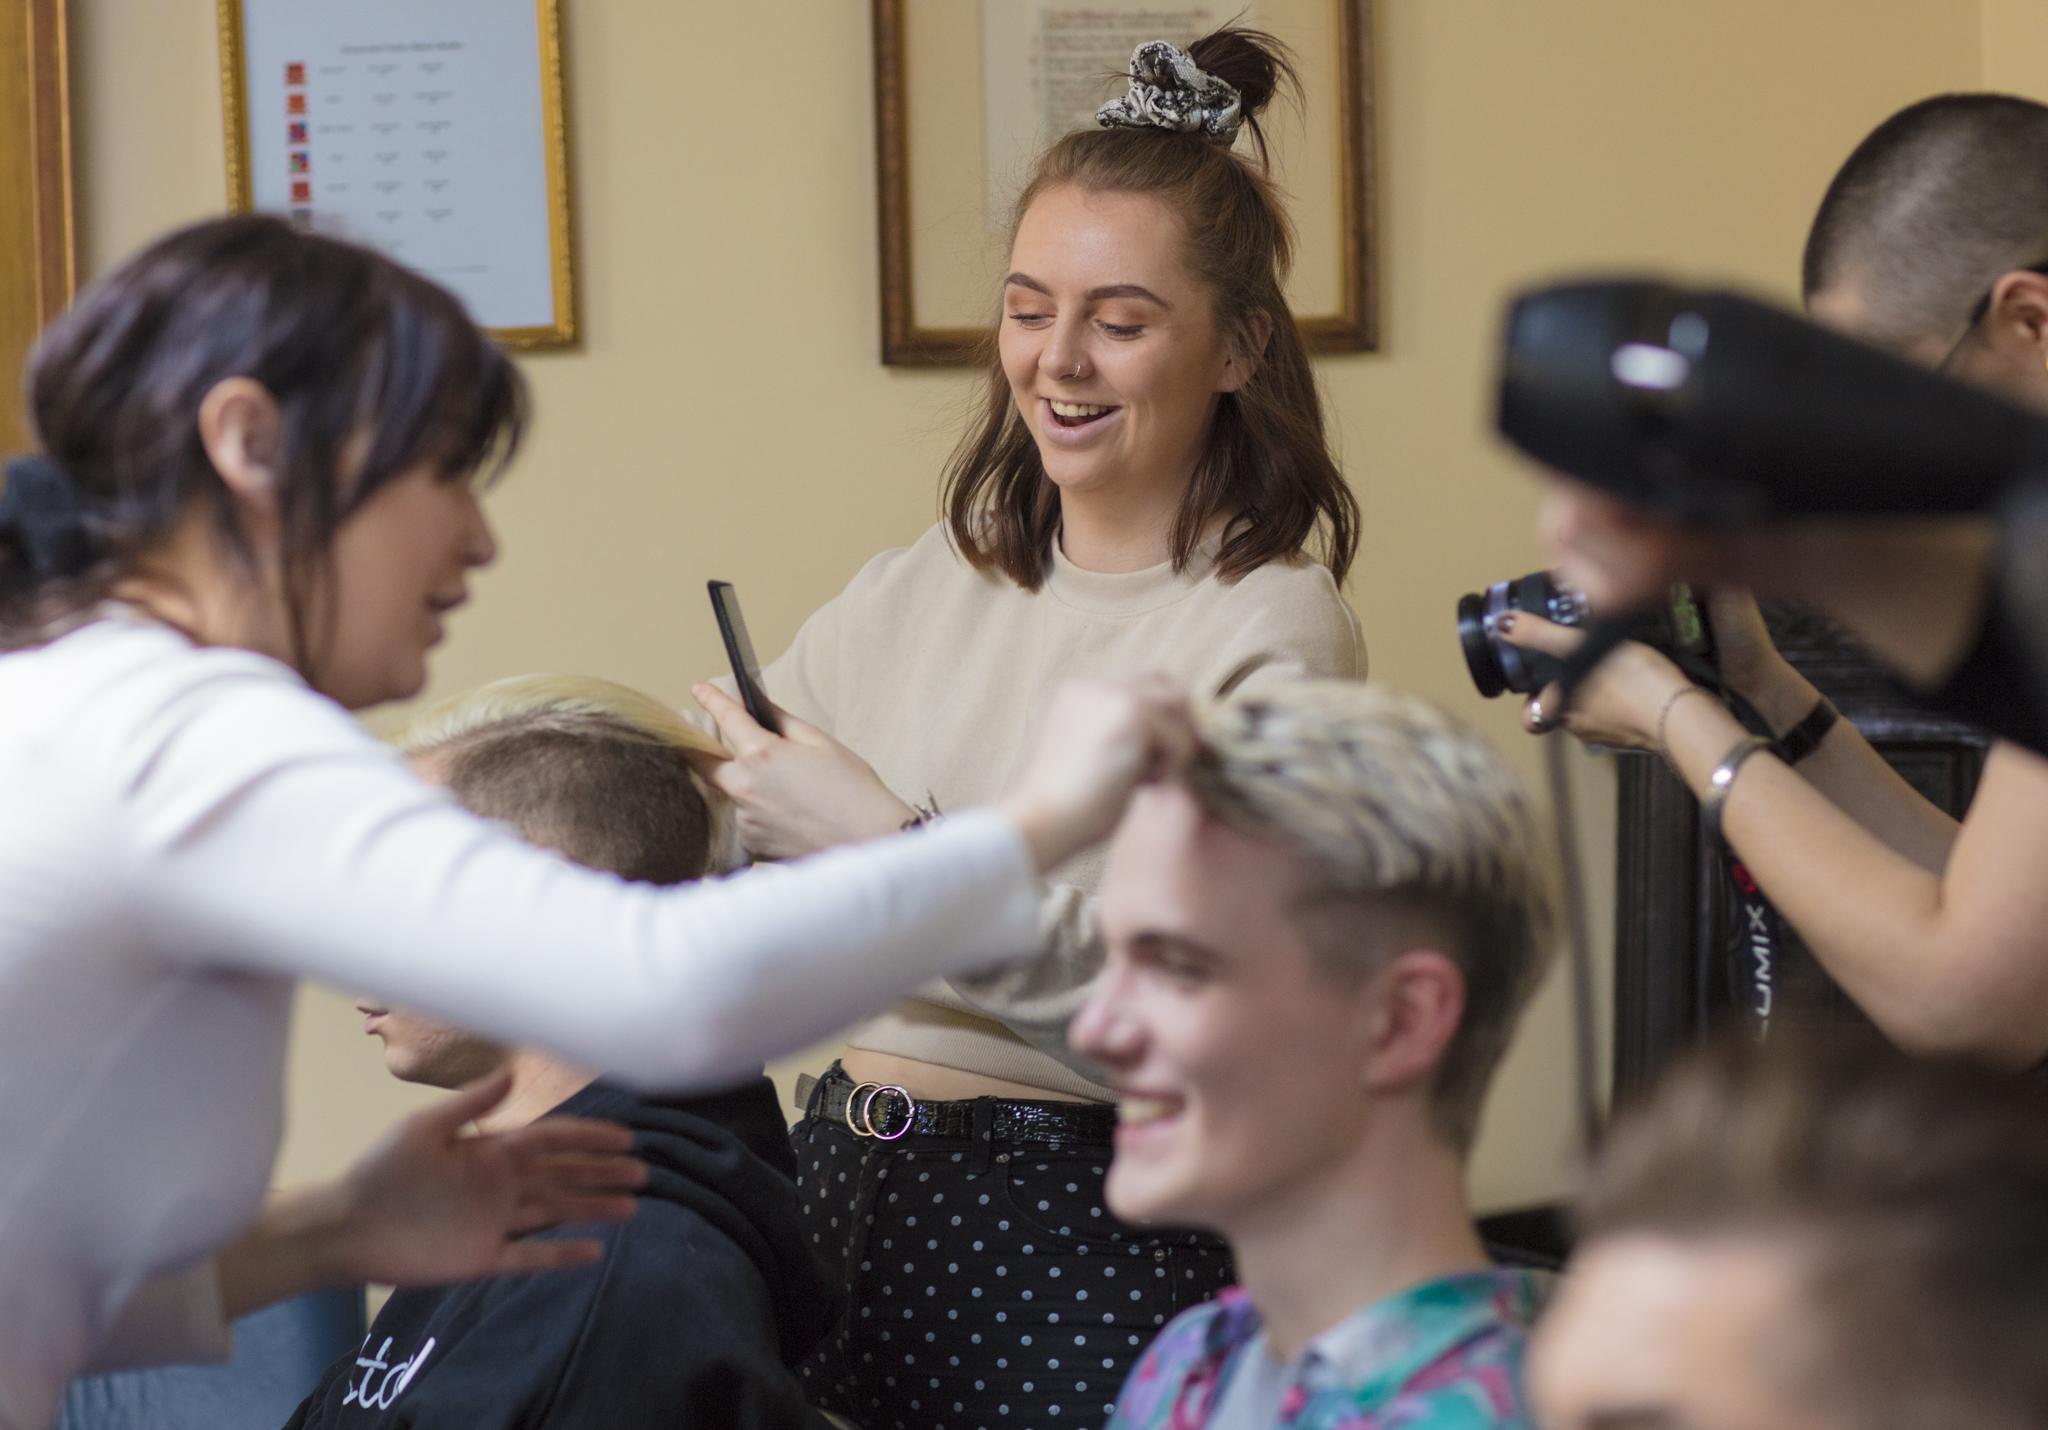 BTS hair stylists Aberdeen Fashion Show 2019_1.JPG